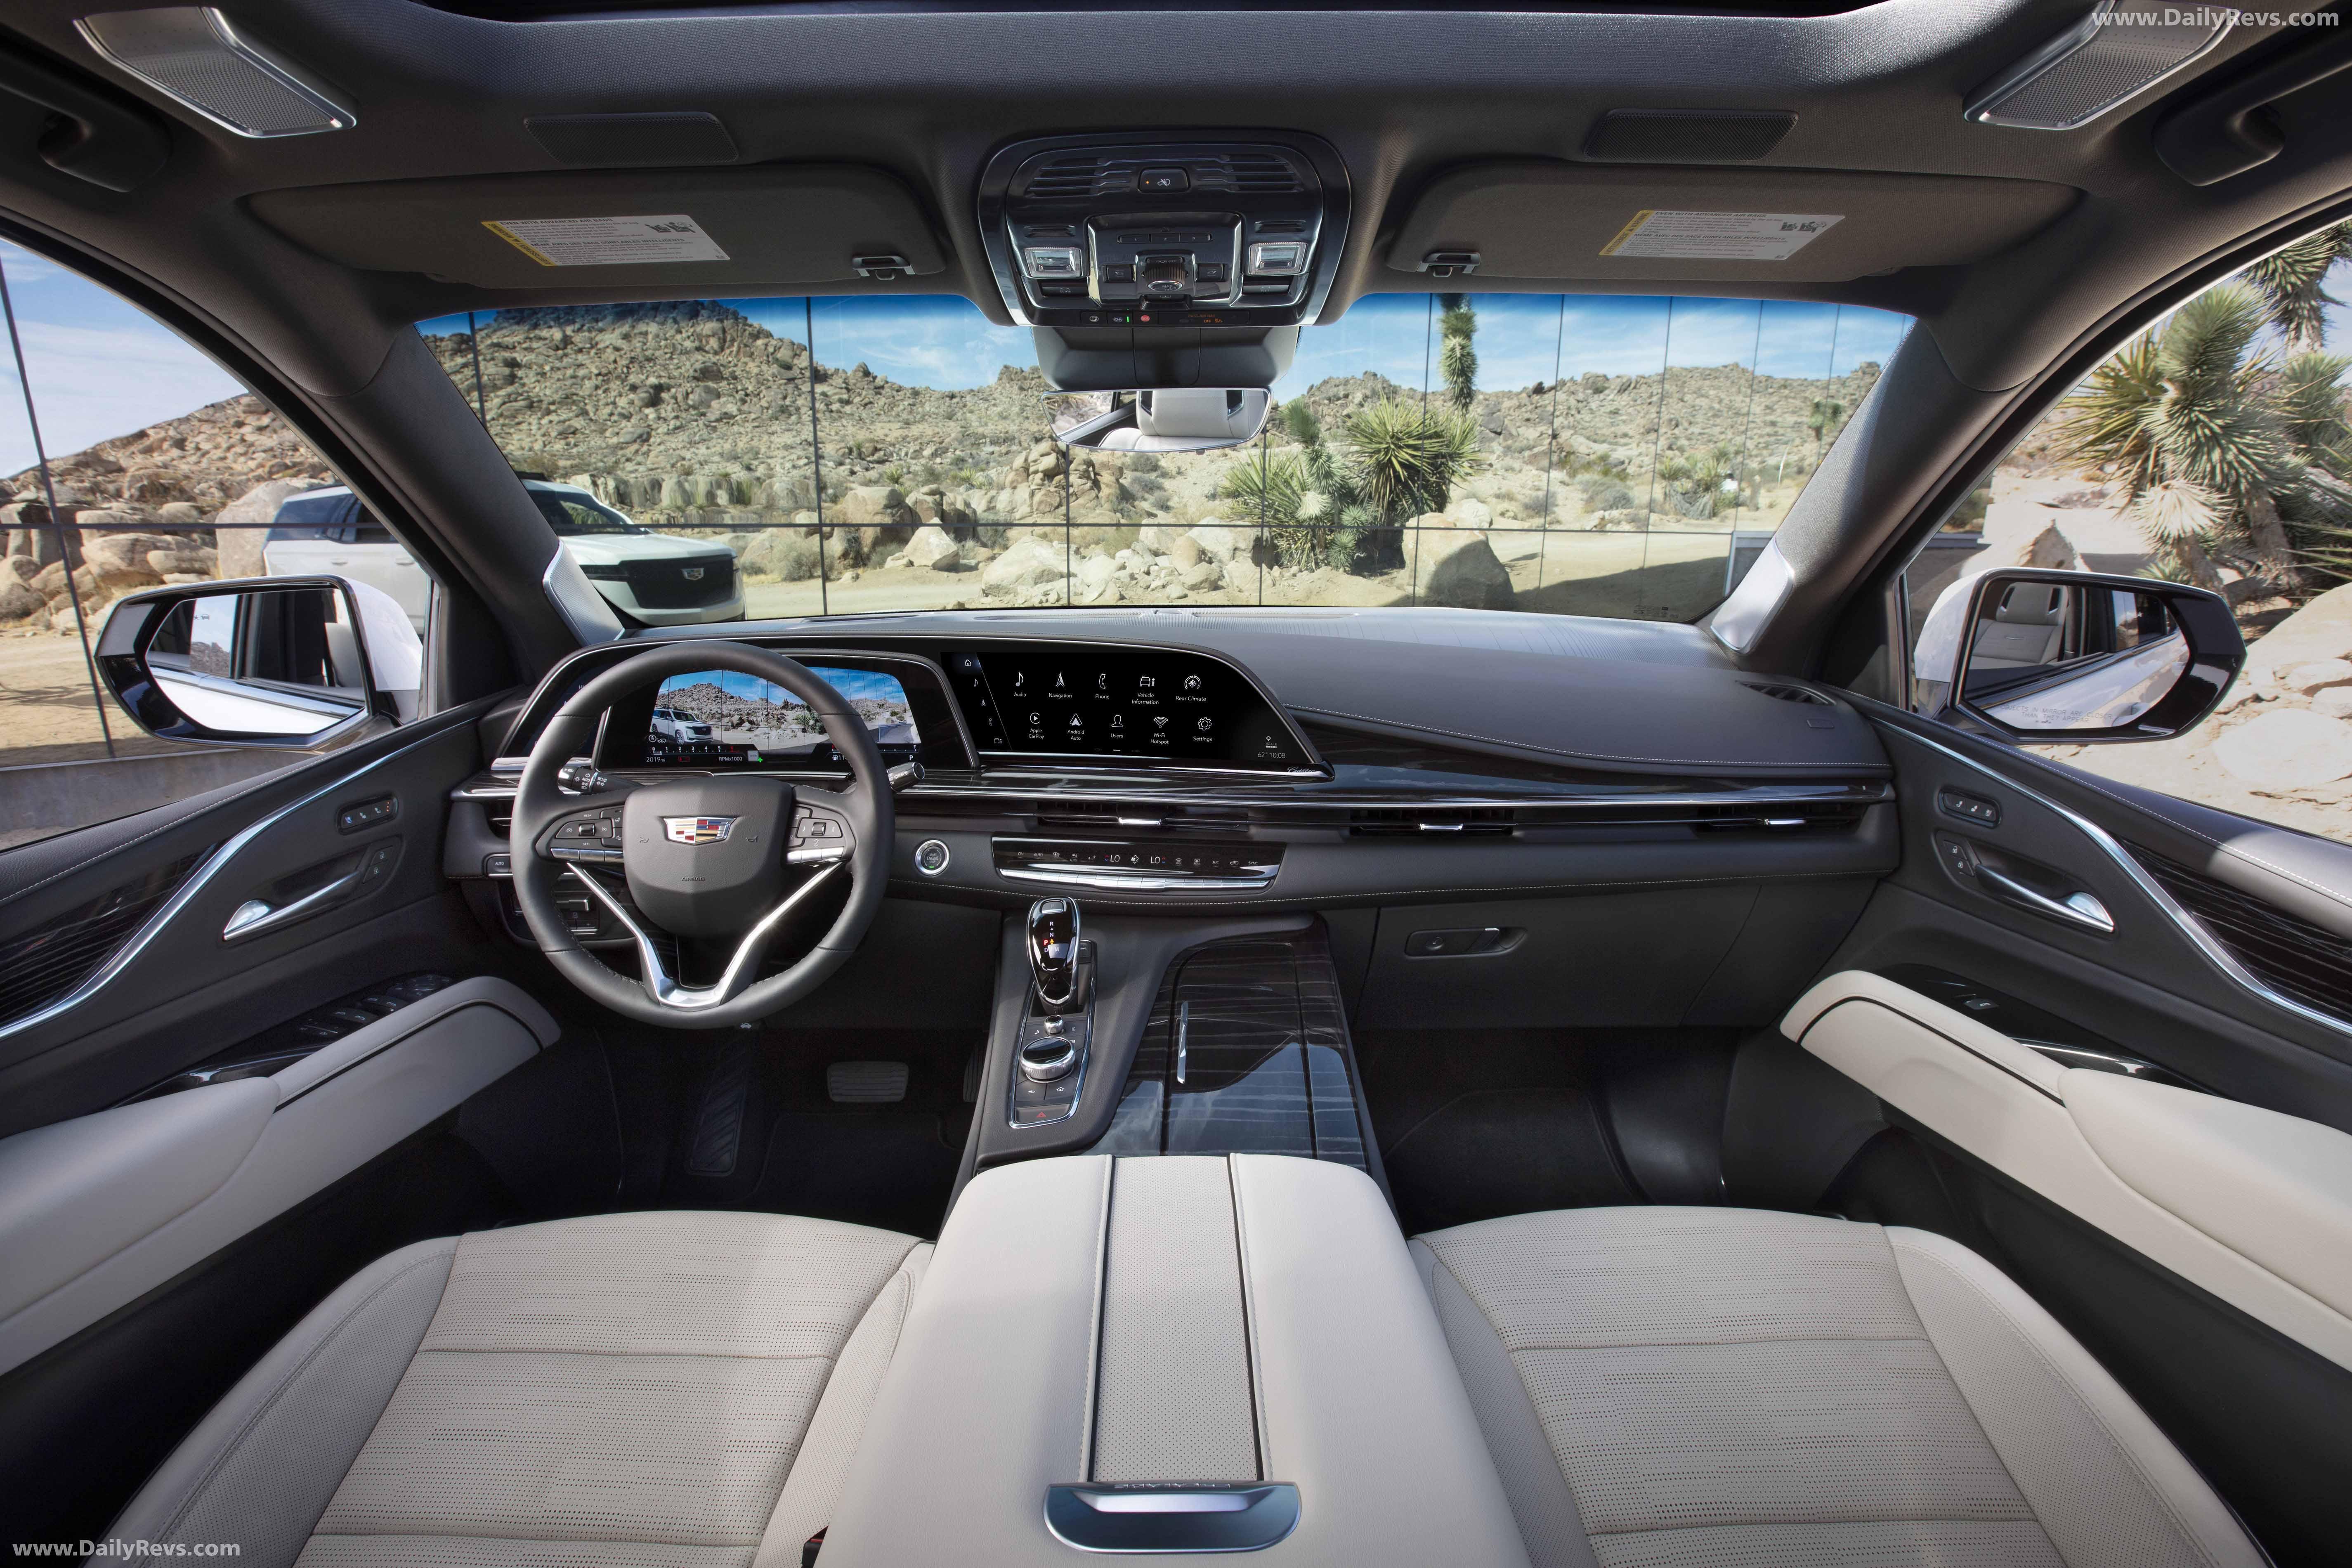 2021 Cadillac Escalade - HD Pictures, Videos, Specs ...